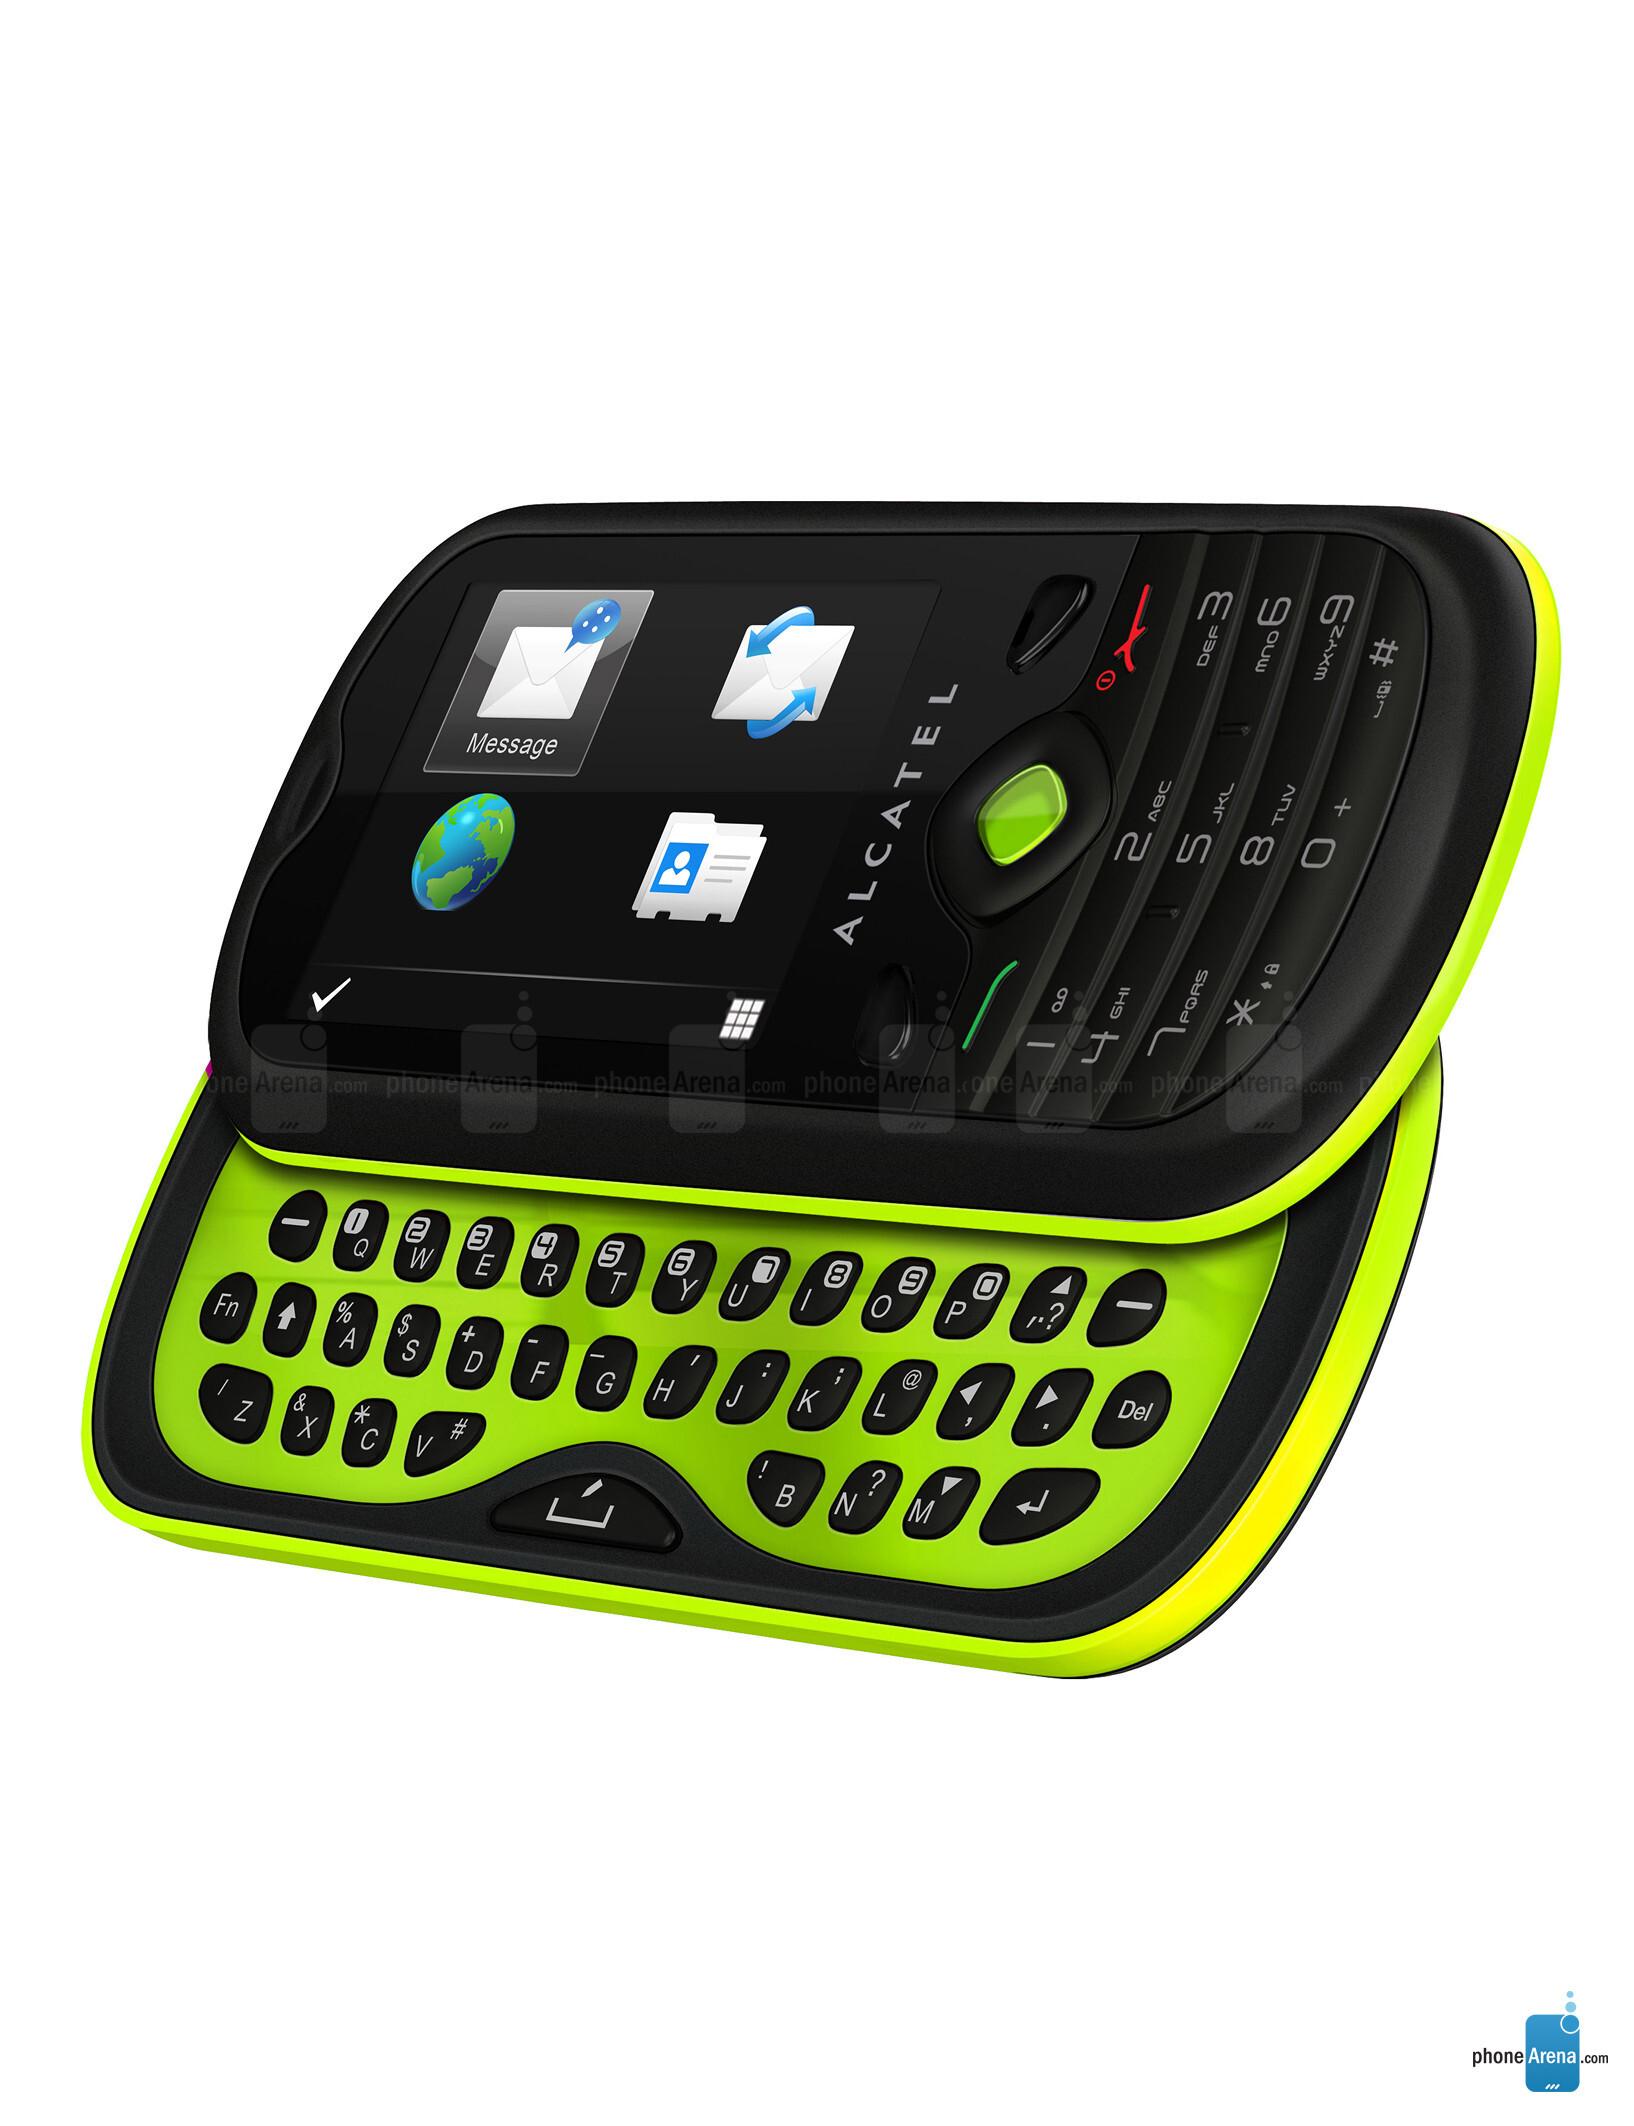 t mobile sparq photos rh phonearena com T-Mobile Alcatel Sparq 2 T-Mobile SPARQ 2 Sim Card Slot